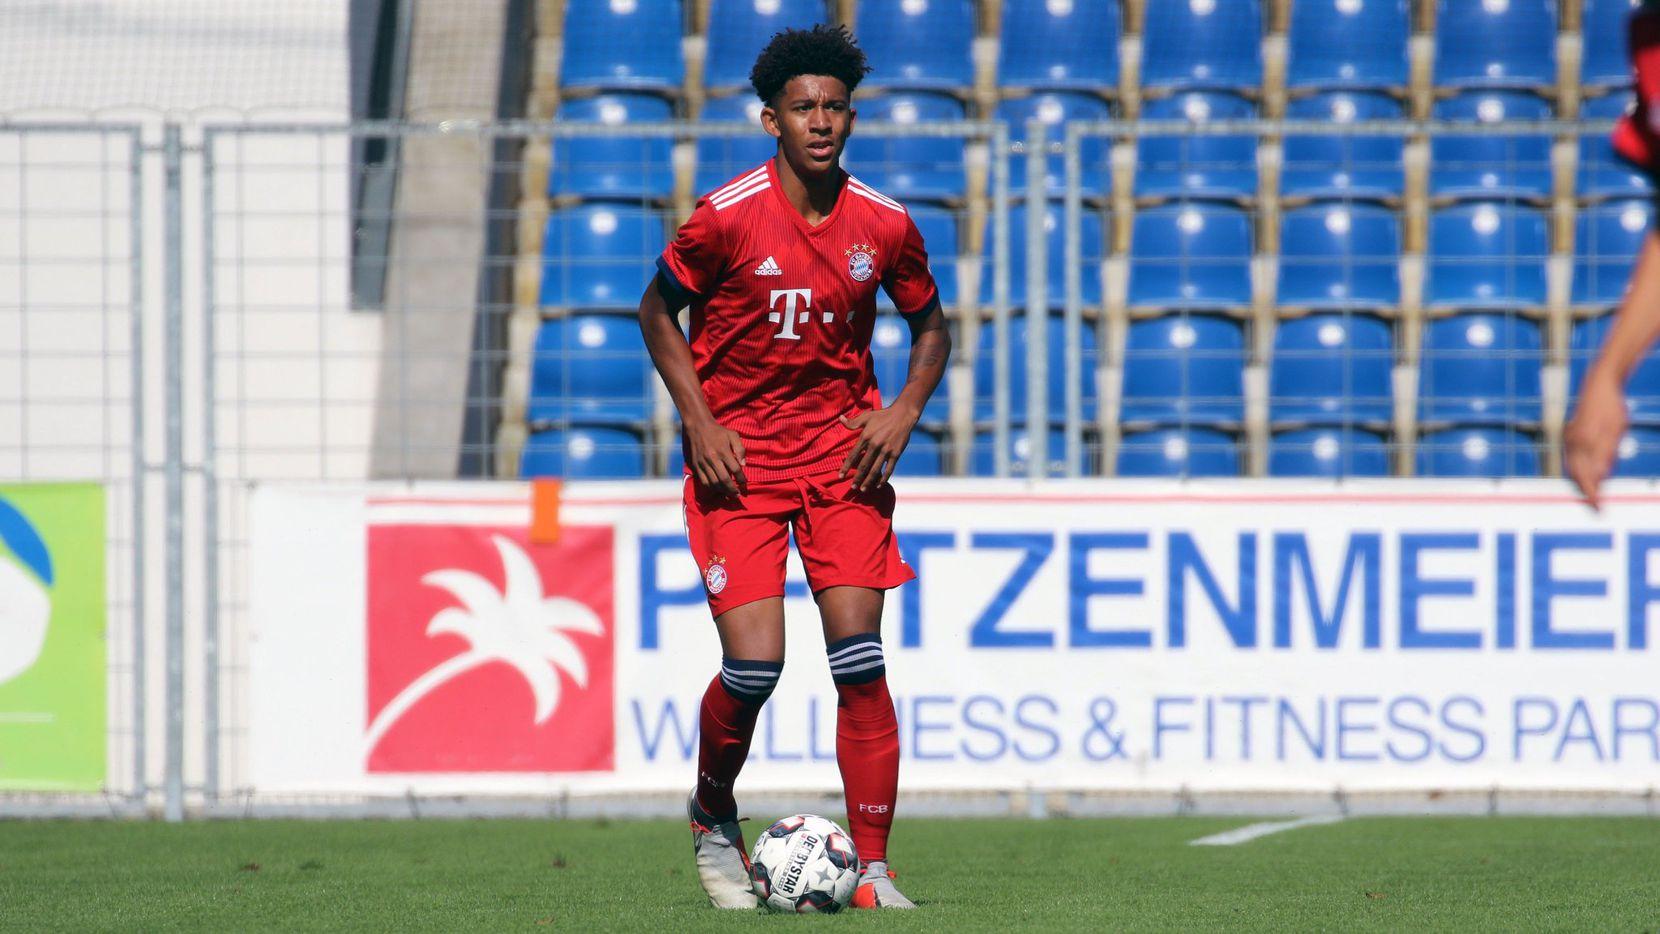 Chris Richards playing for Bayern Munich U19s on loan in 2018.